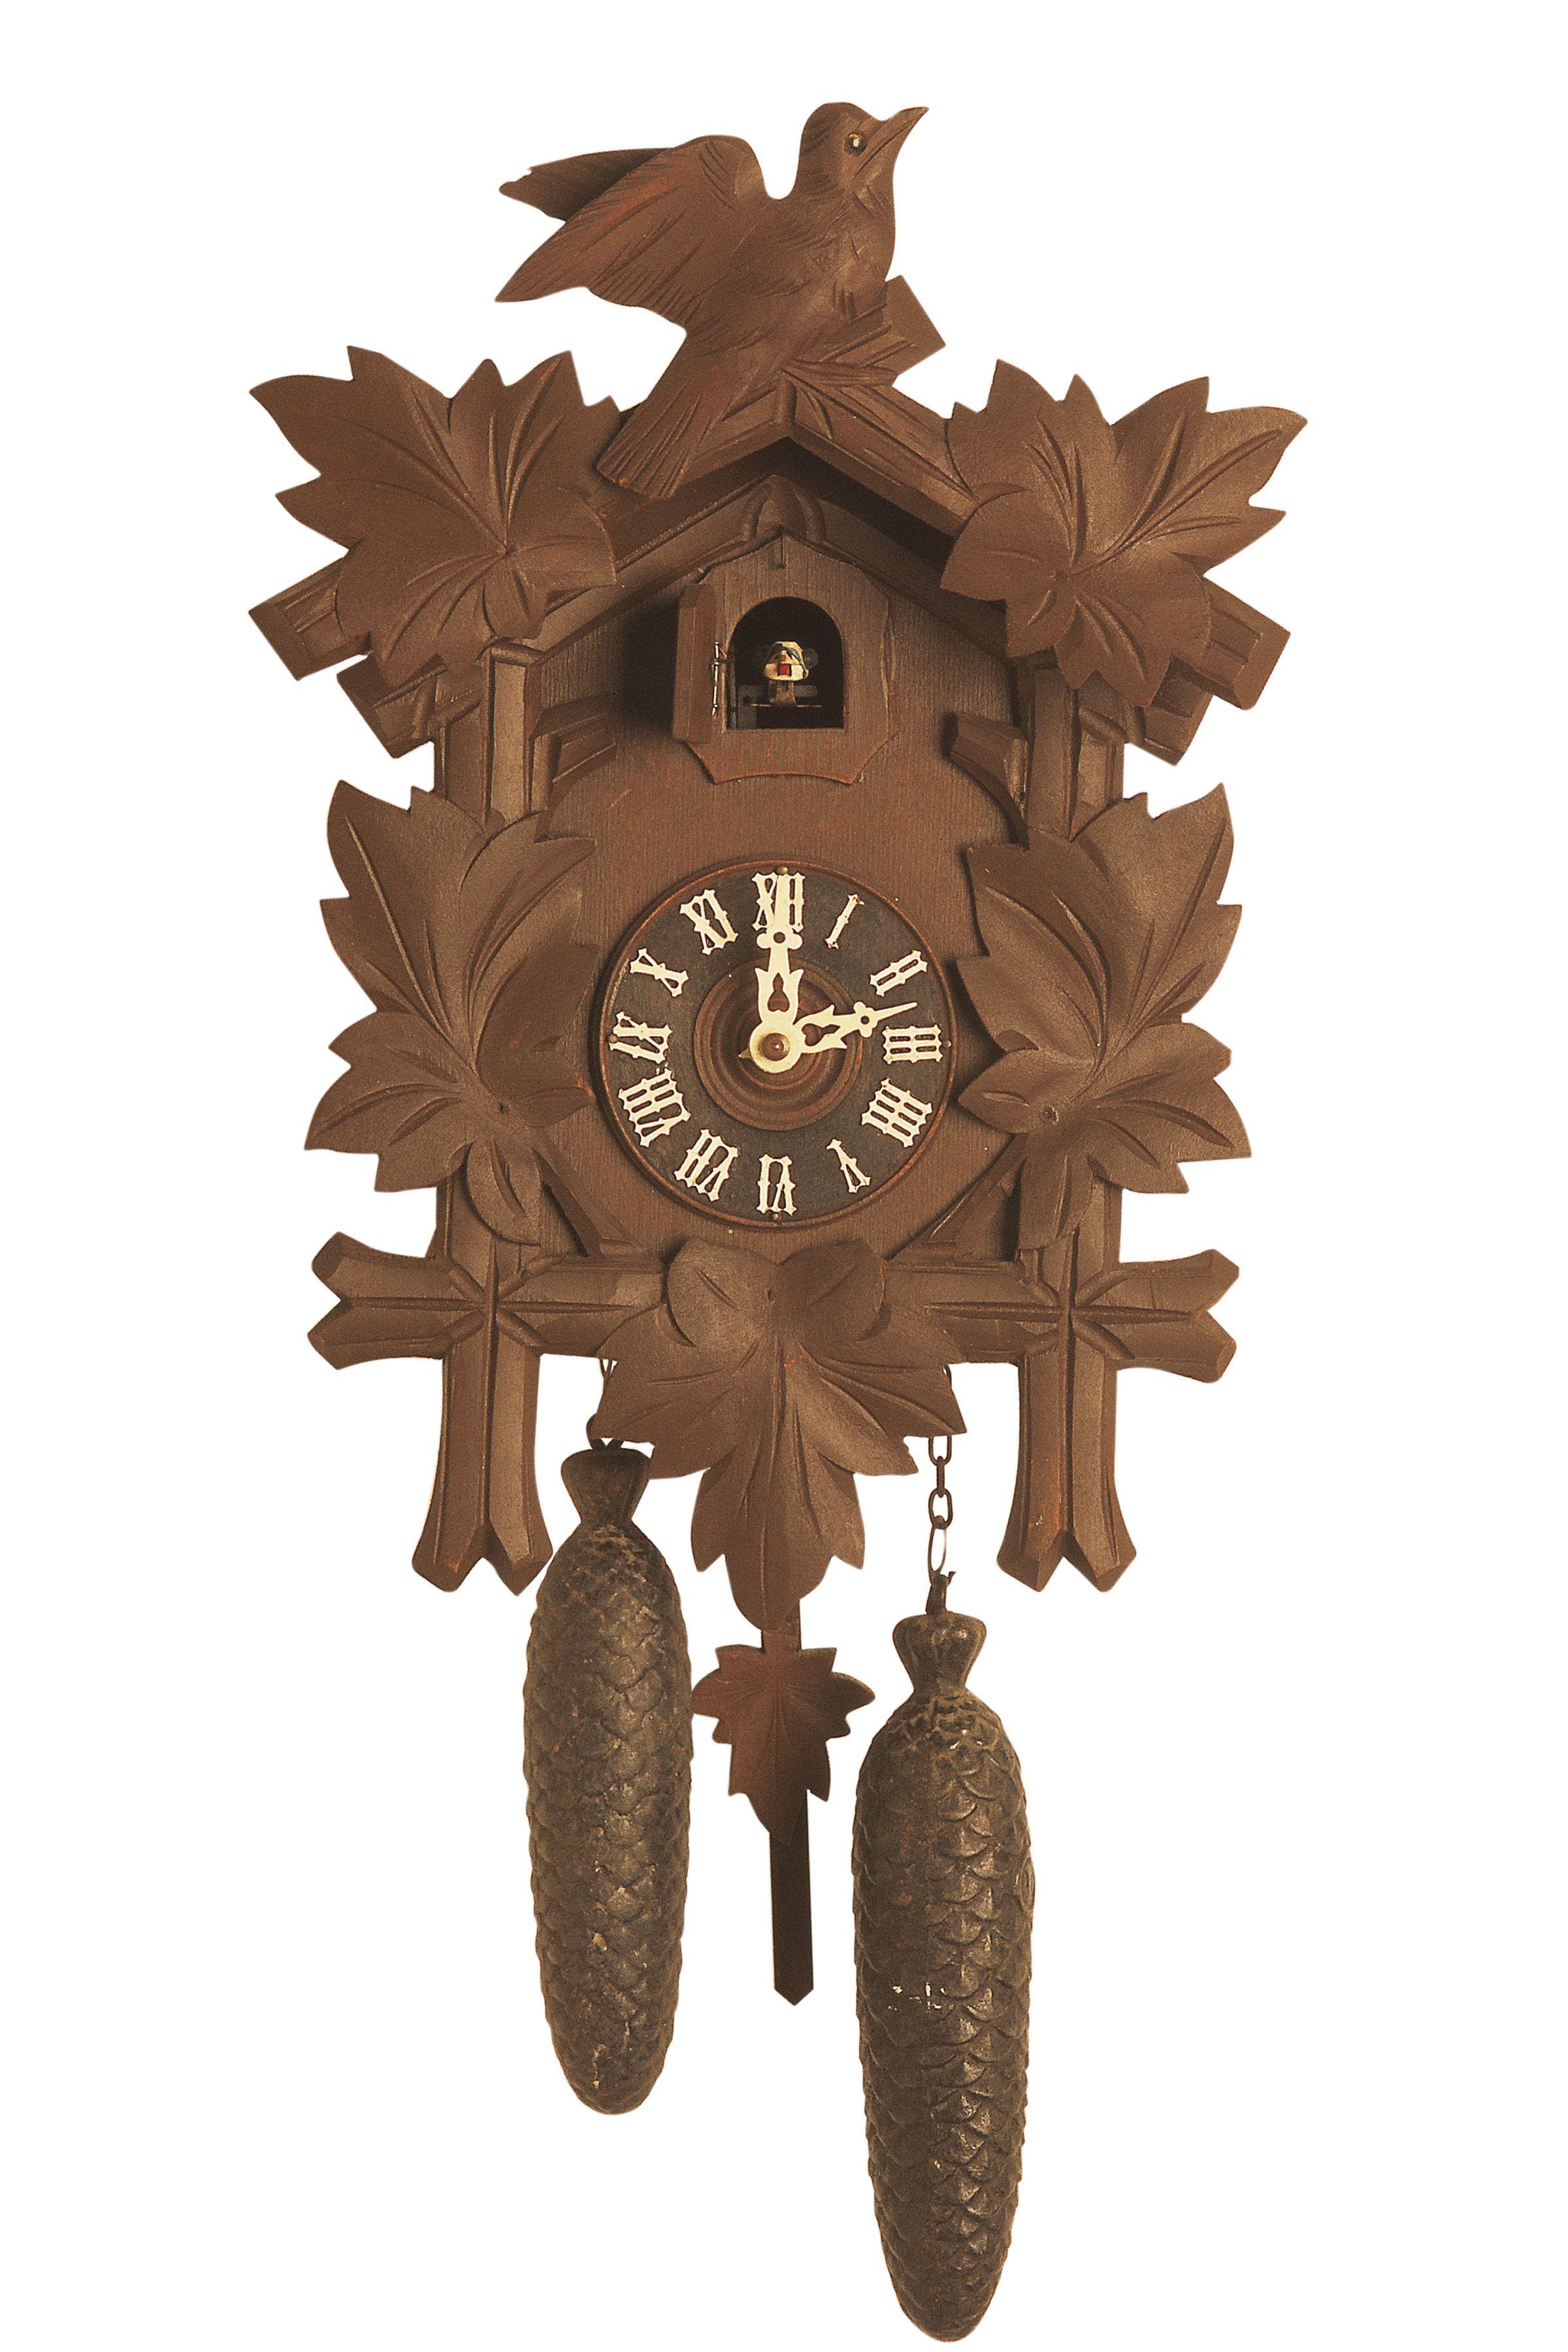 Como Consertar Um Relogio Cuco Fabricado Na Alemanha In 2020 Clock Cuckoo Clock Vintage Clock